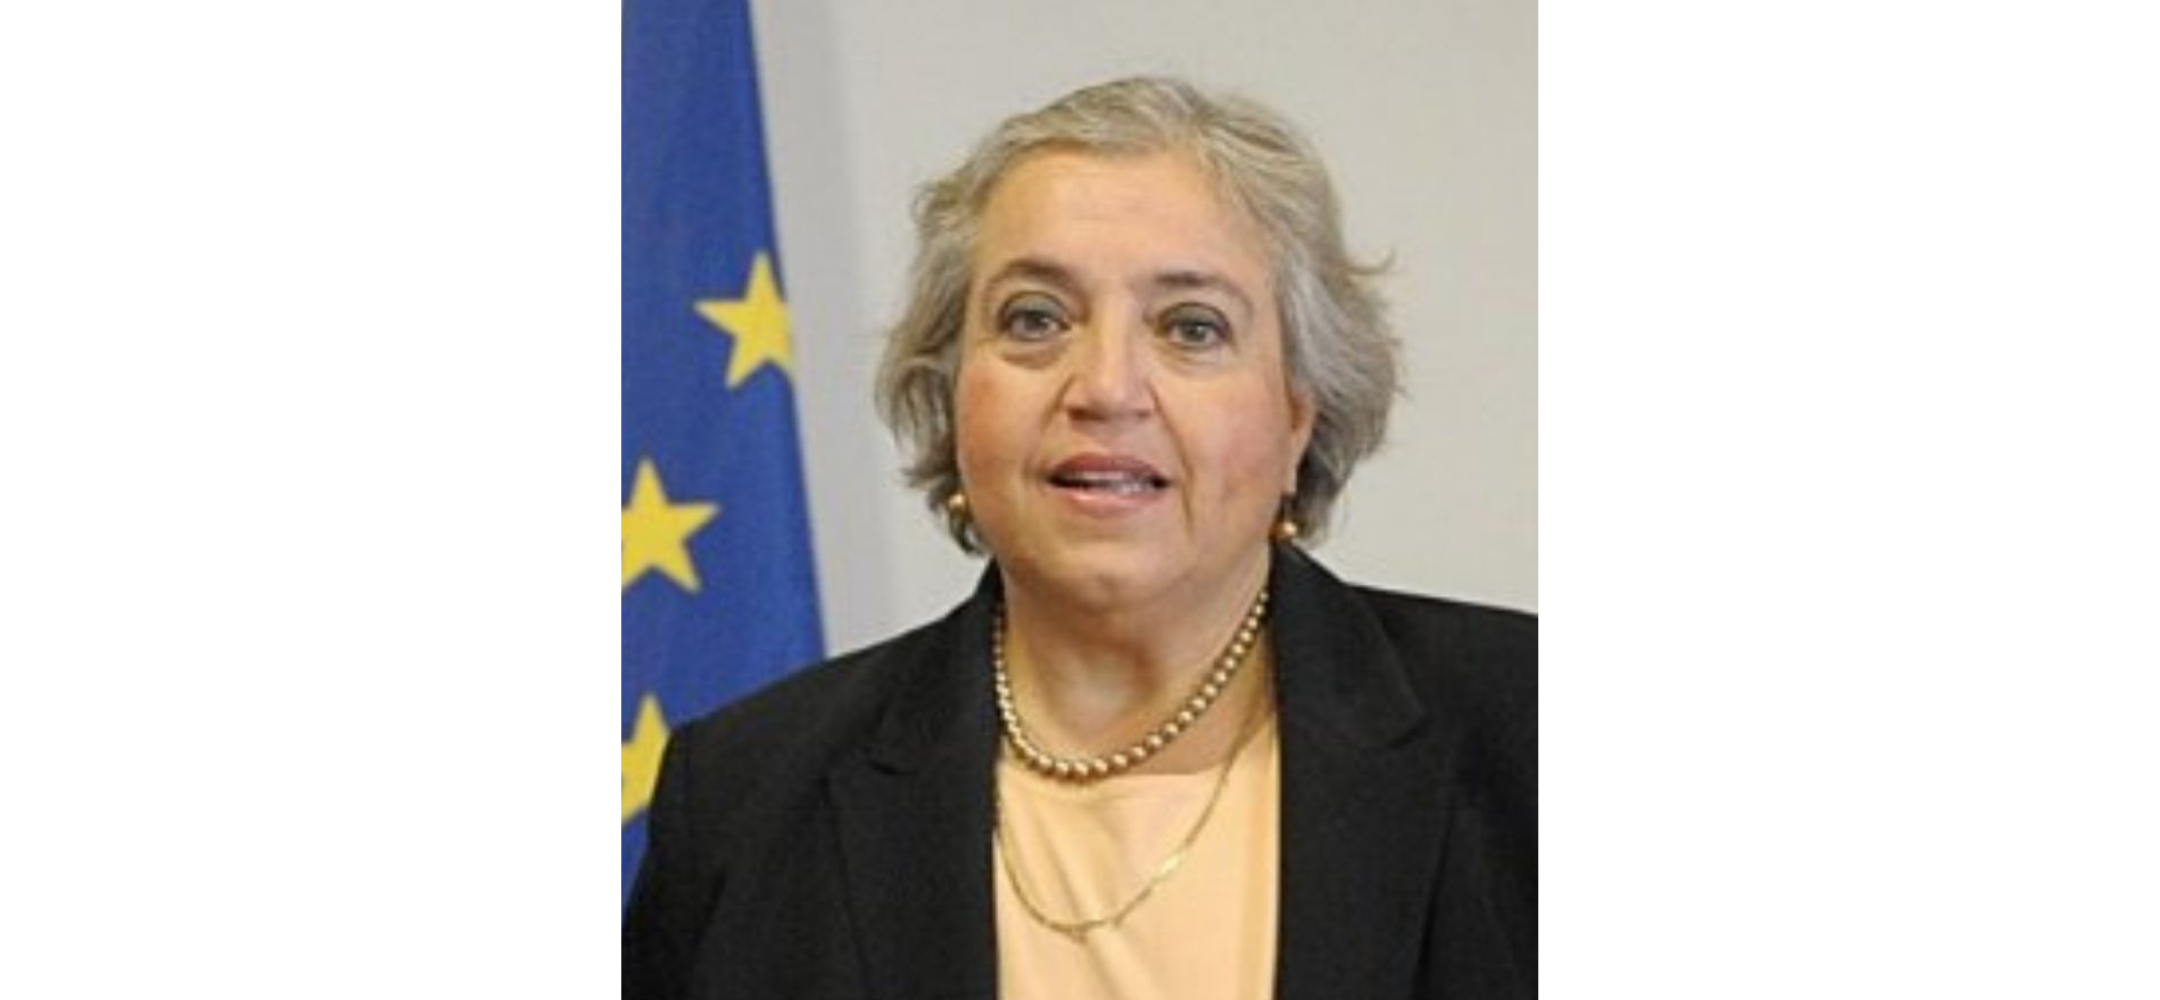 Her Excellency Alexandra Papadopoulou Ambassador of Greece to the U.S.